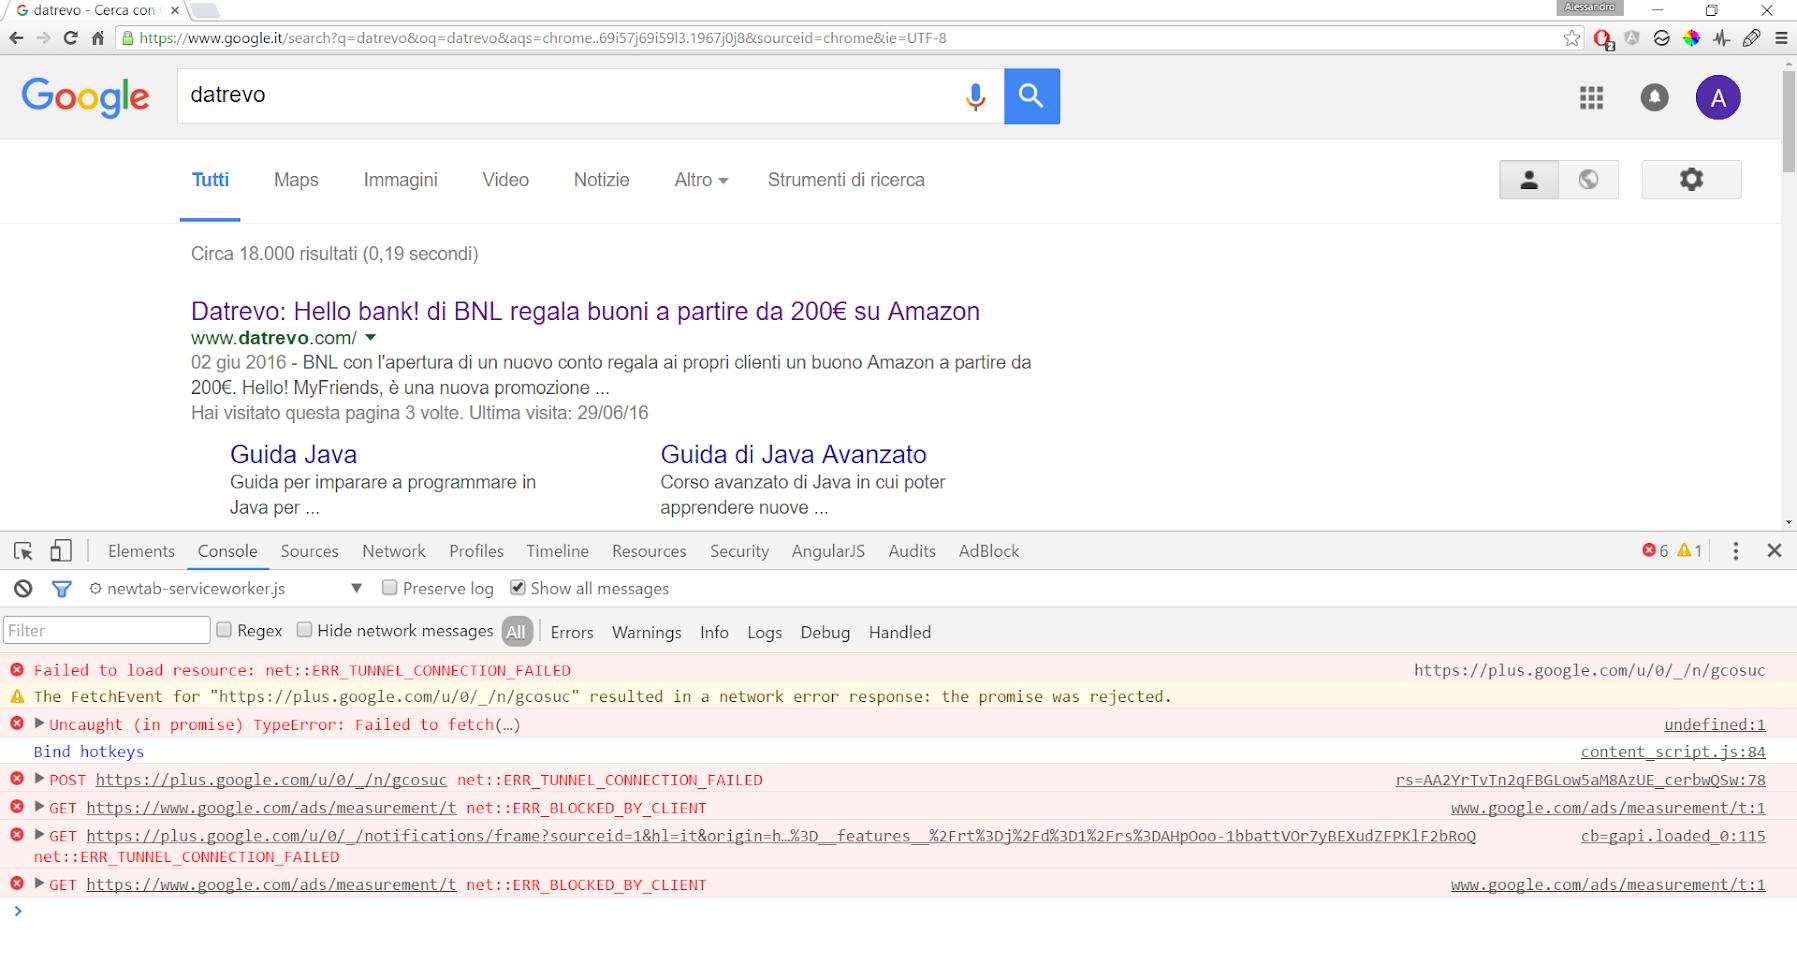 Google Developer Tools - Console